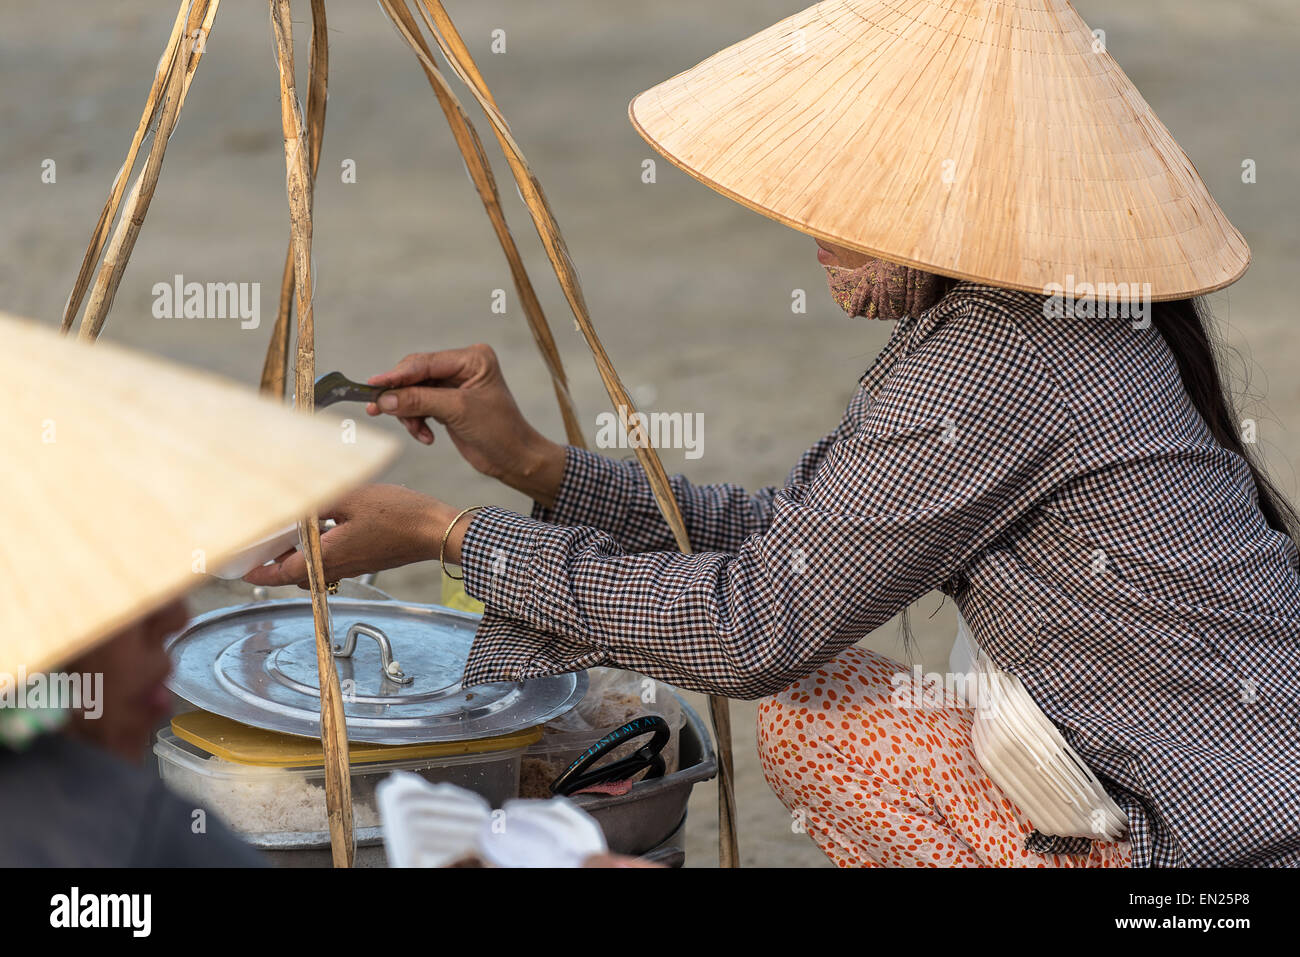 A Food Vendor On The Beach At Mui Ne Fishing Village. - Stock Image